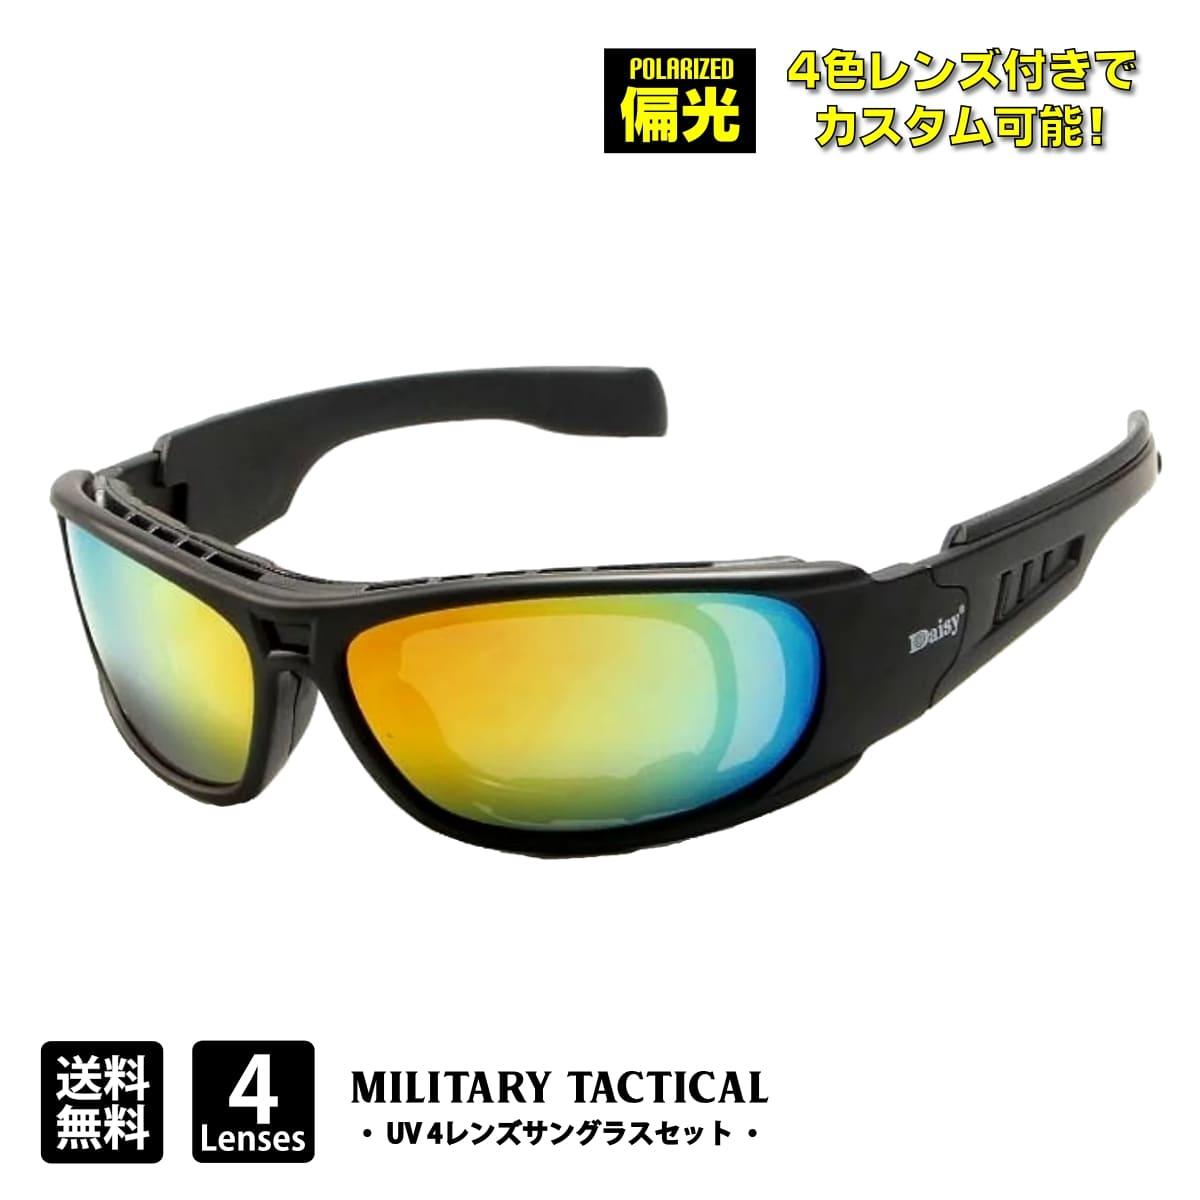 93cdcbf8700c The [Military Tactical UV 4 Lens Sunglasses/Goggles] military タクティカル, UV .